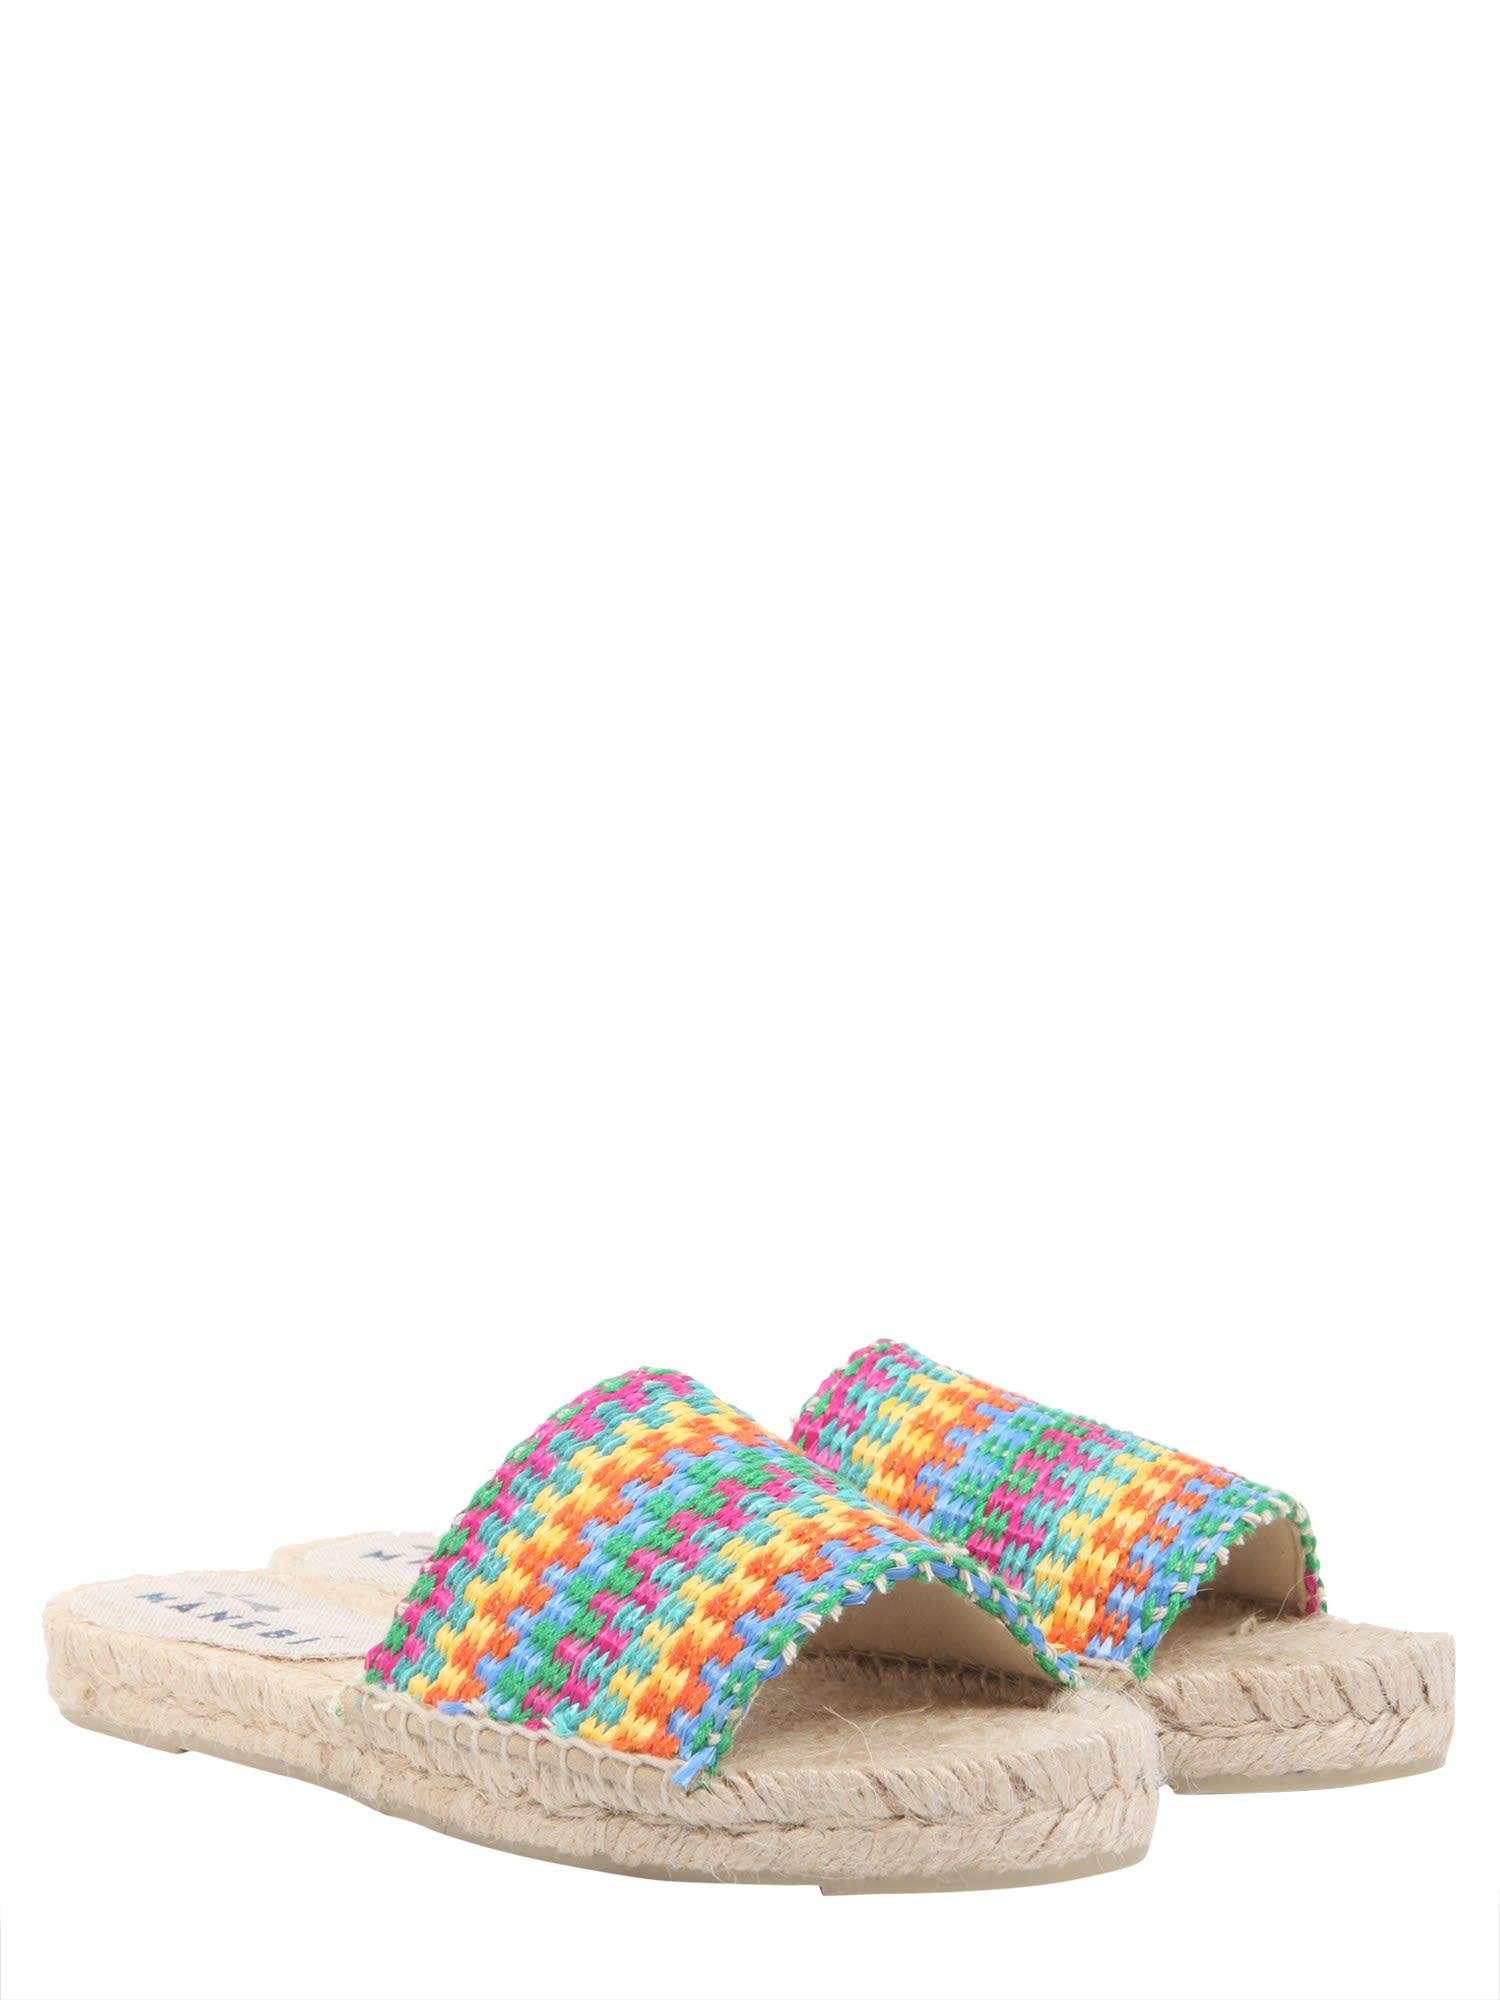 MANEBI Yucatan slide sandals pOqaylR